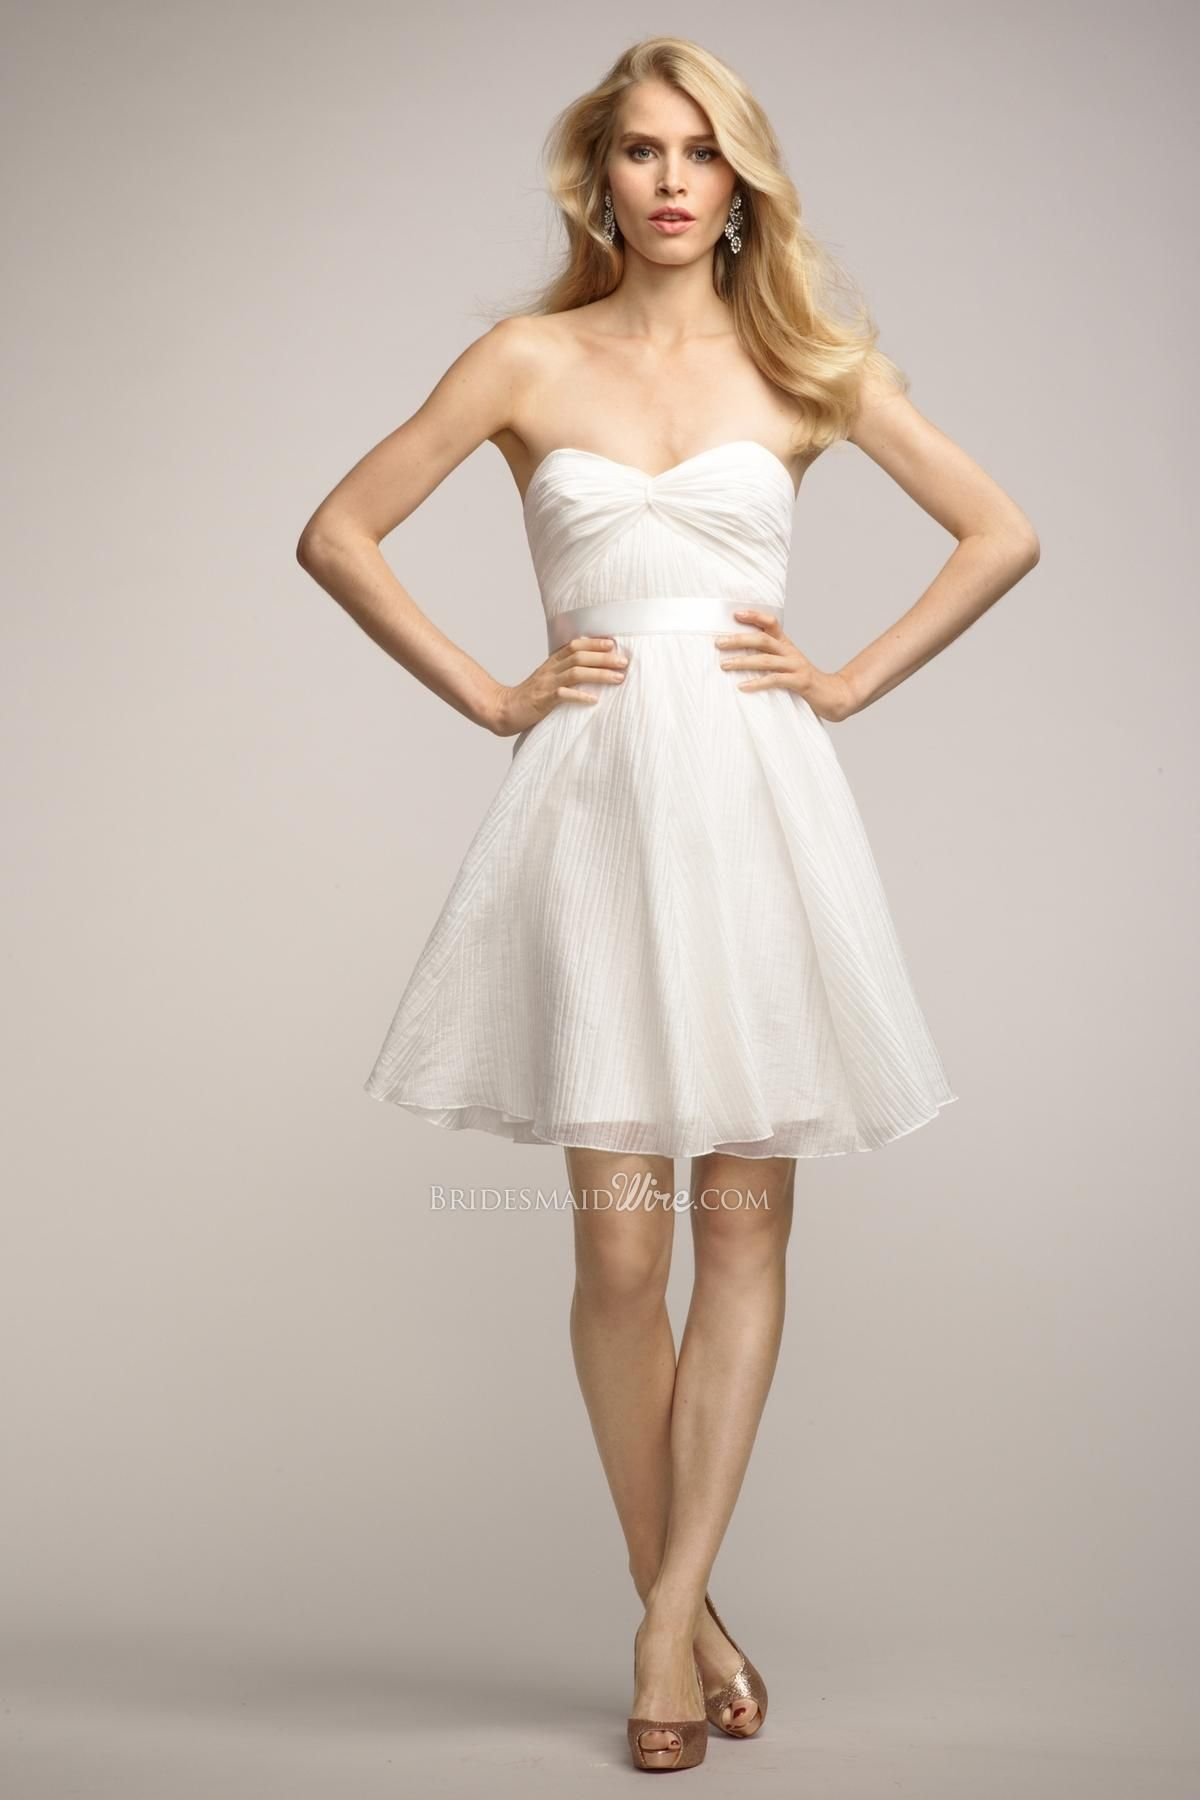 White Strapless Short Bridesmaid Dresses